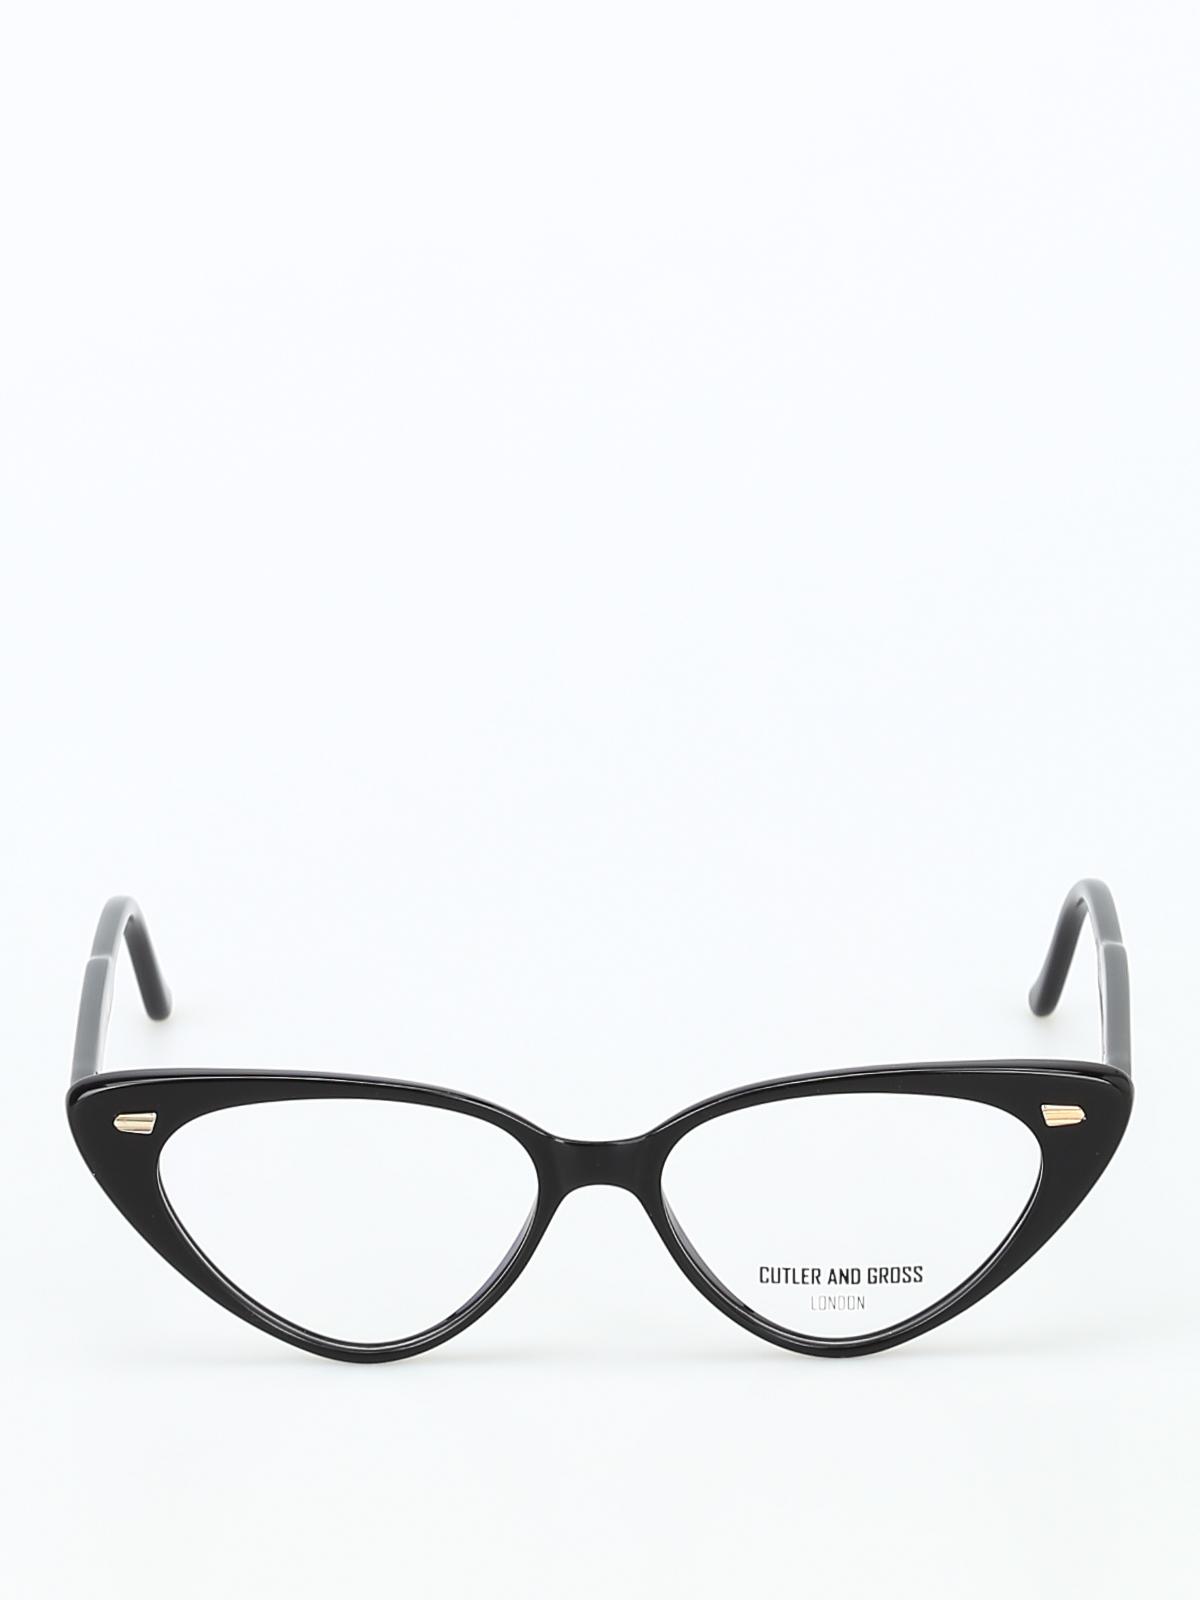 436f74d2d87 iKRIX CUTLER AND GROSS  Glasses - Super trendy black acetate cat-eye glasses